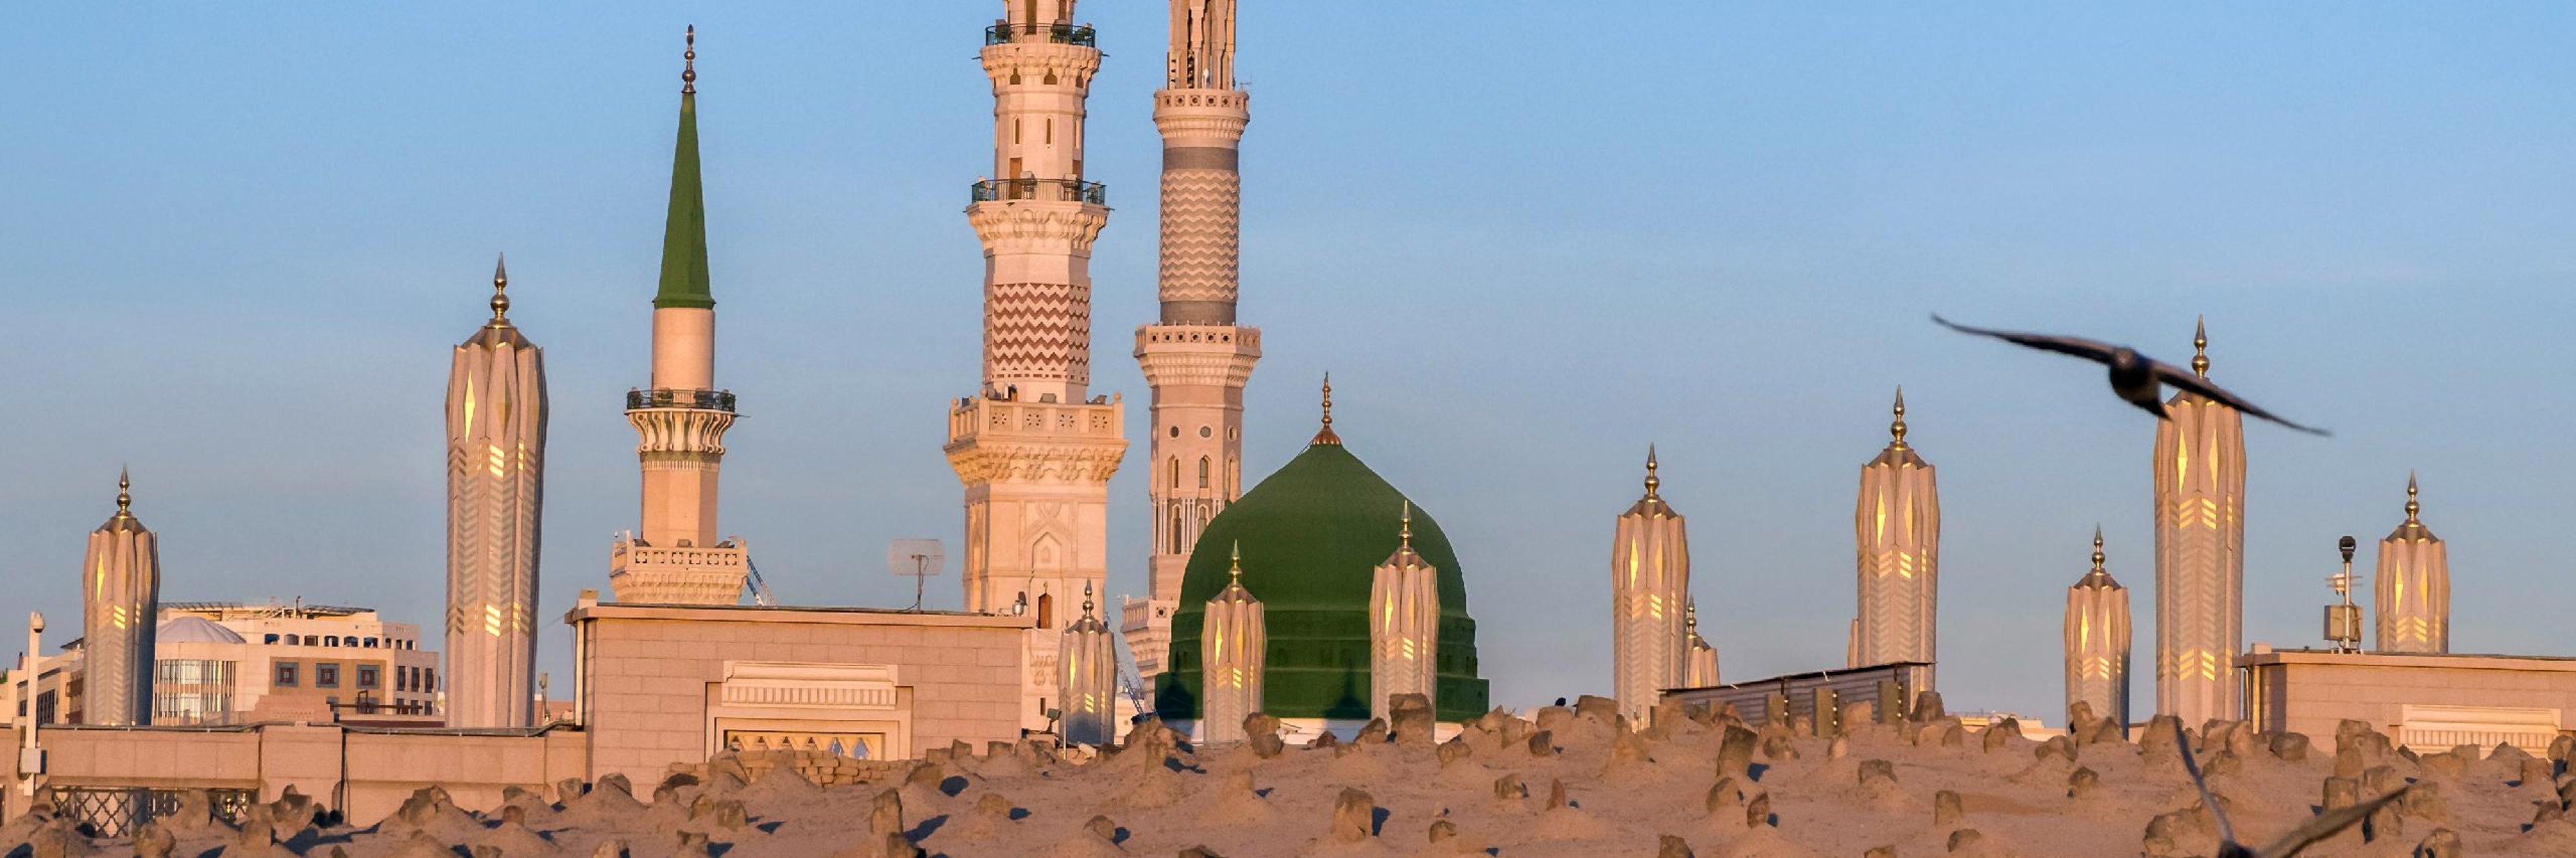 Is Islam a Death Cult? Martyrdom and the American-Muslim Imagination